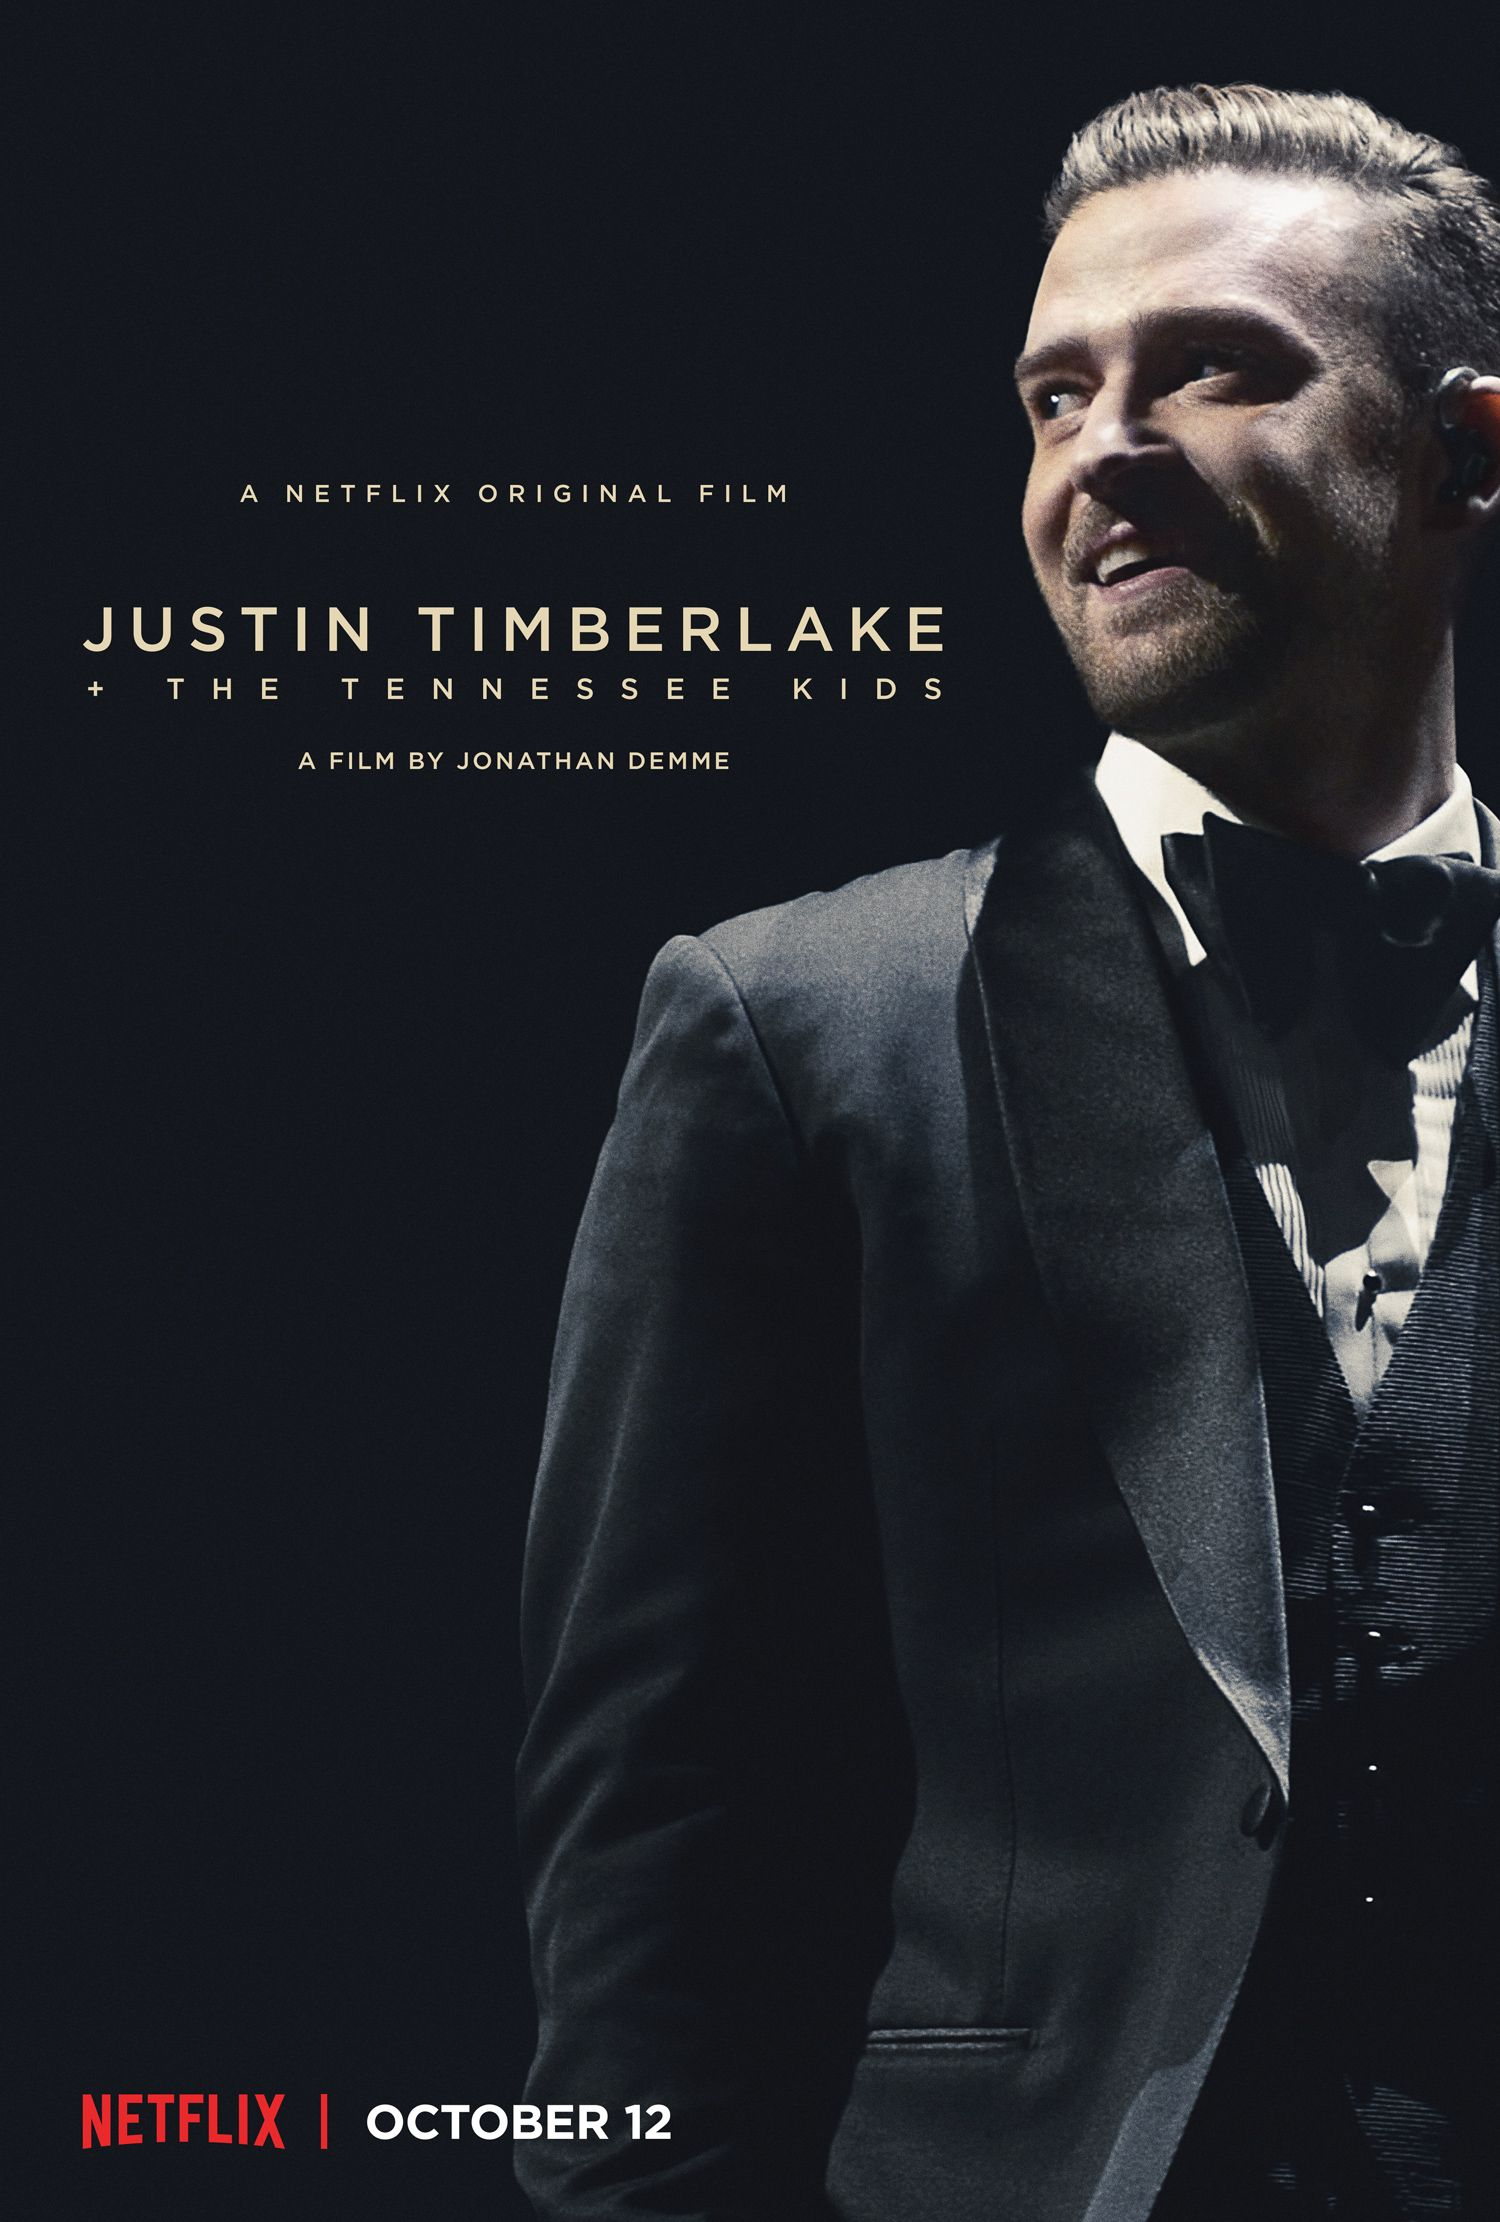 Justin timberlake sexy posters